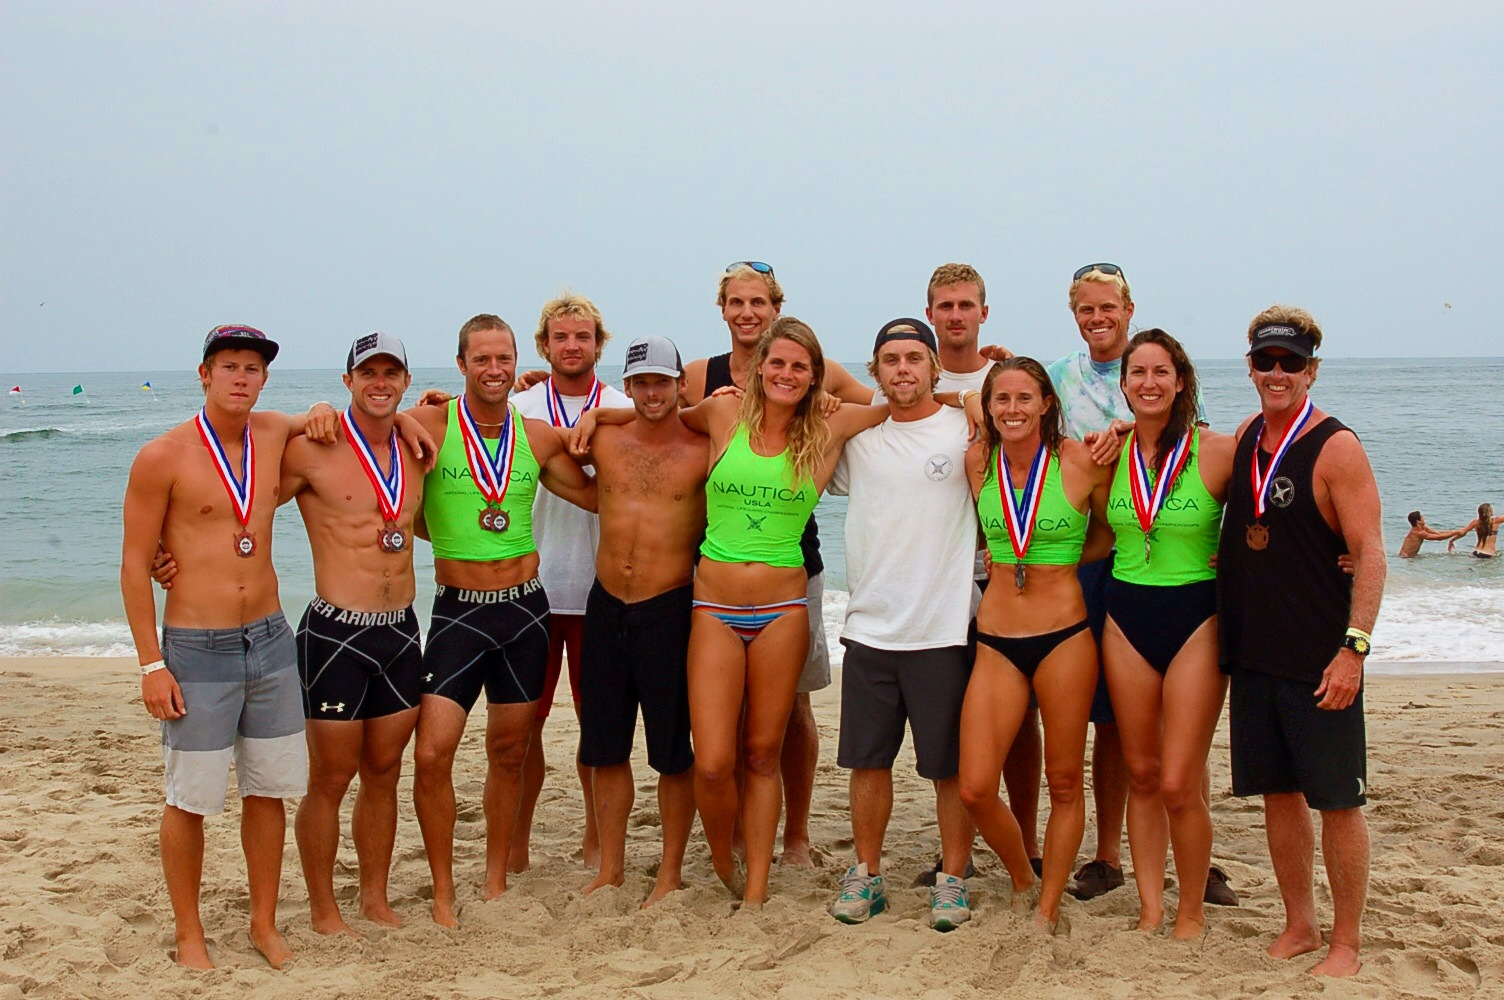 Wrightsville Beach Events August